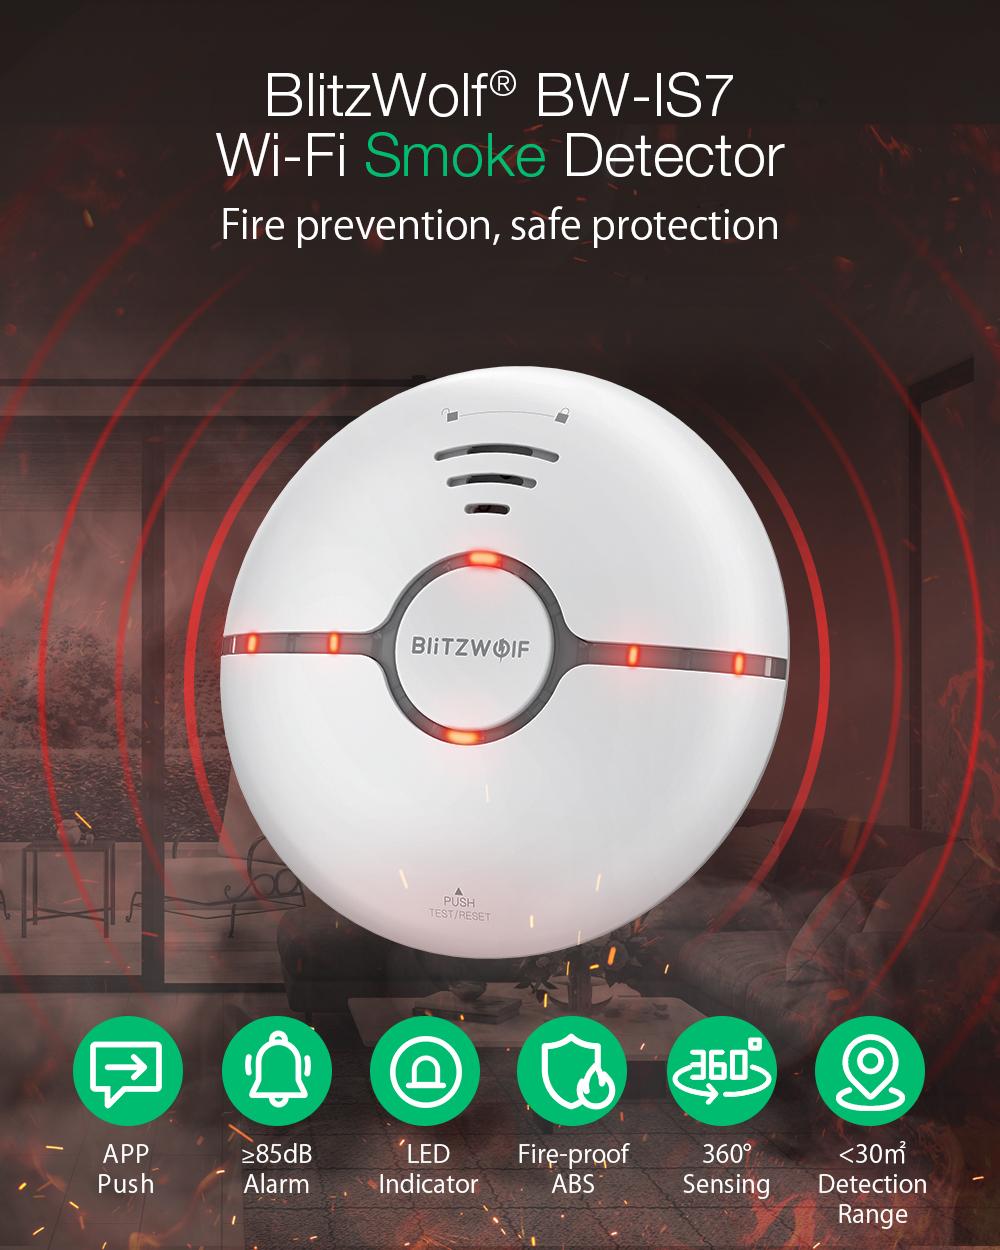 Blitzwolf BW-IS7 smart smoke detector